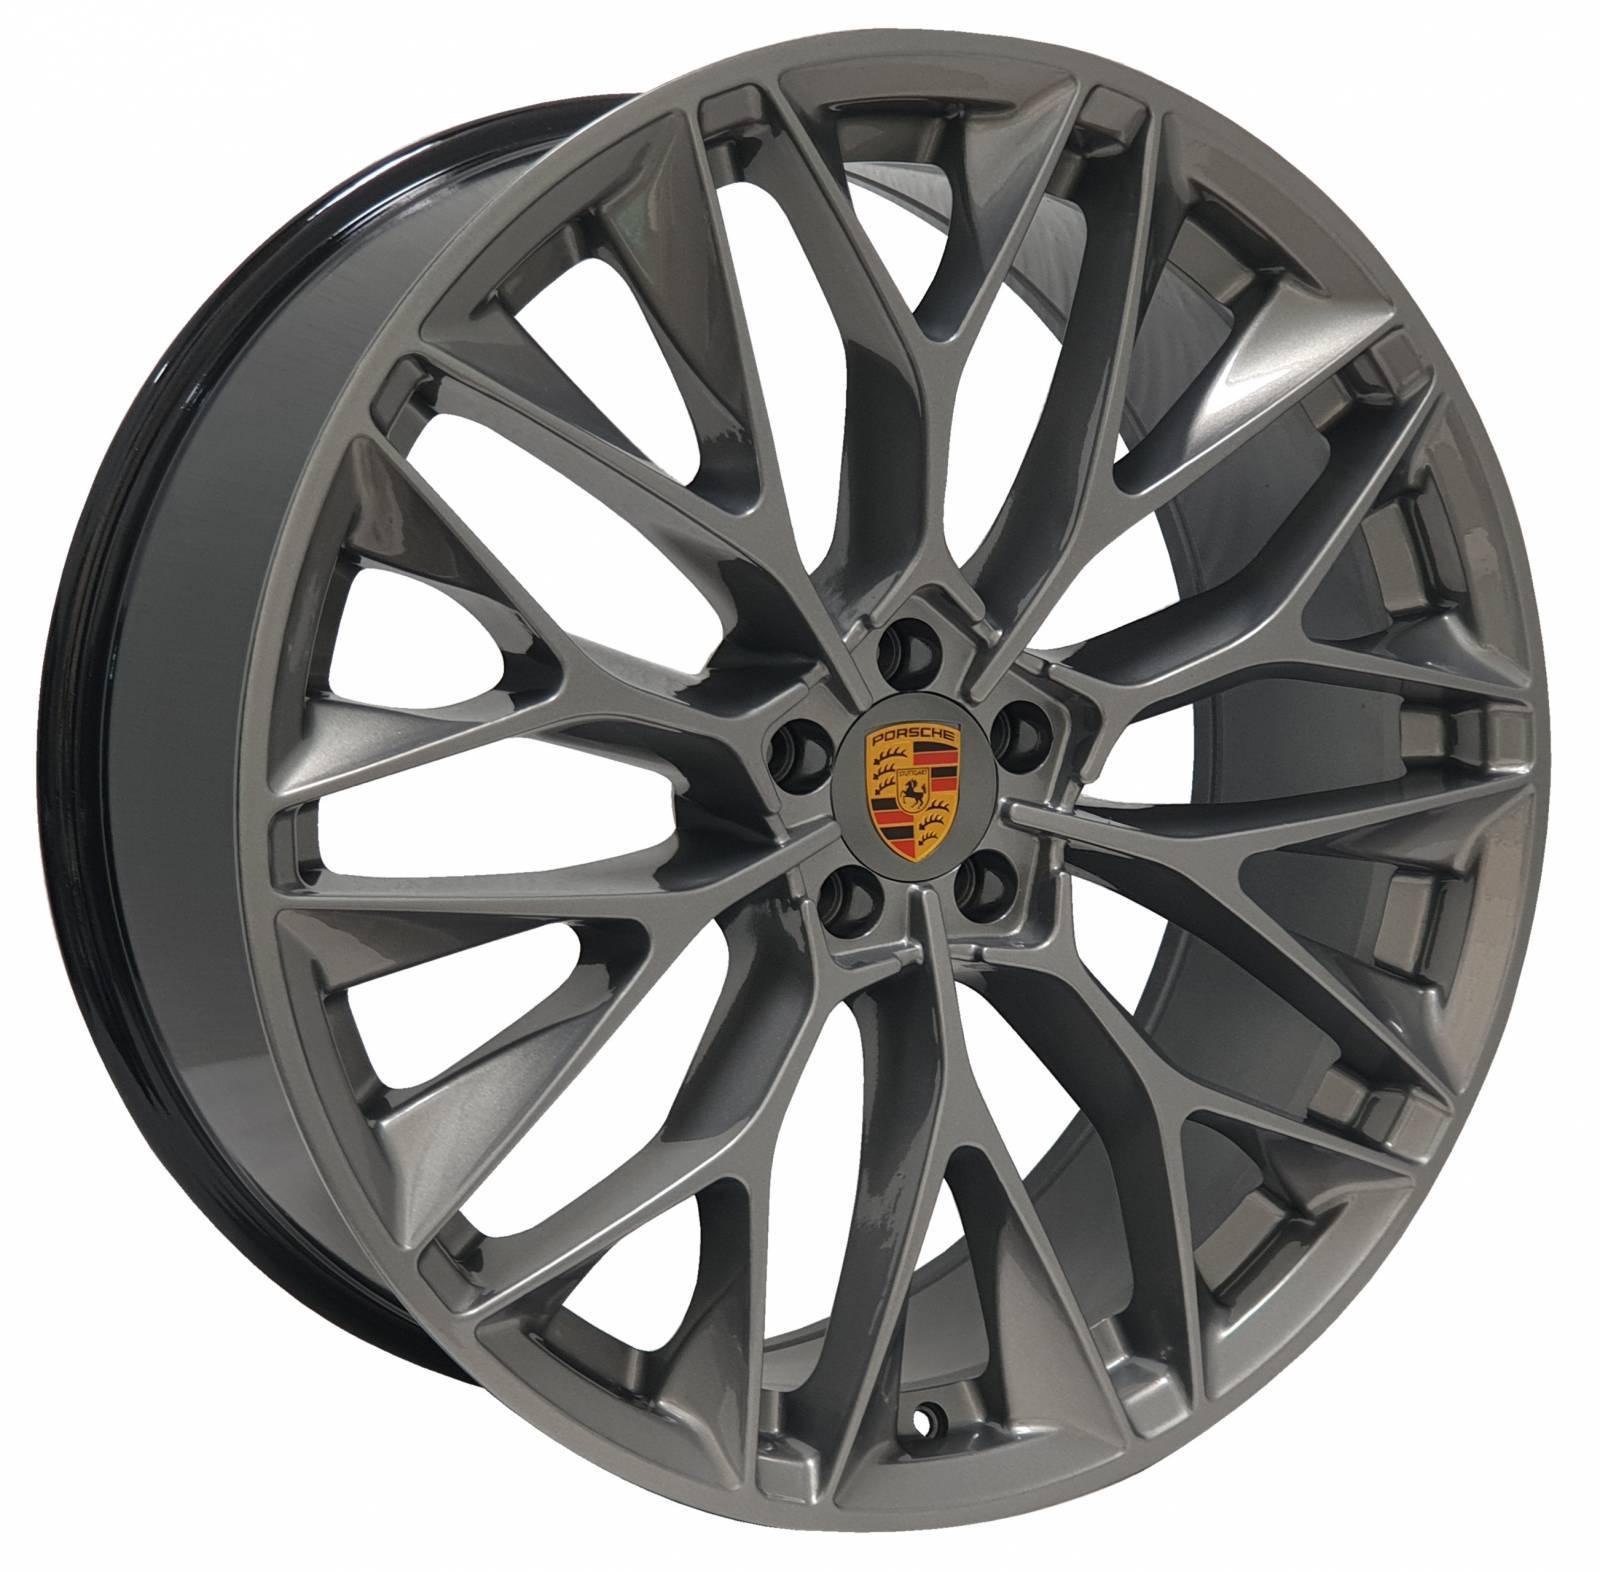 Jogo Rodas Porsche Macan P-200 ZWPC1 22X90 5X112 (ET:22 e 28) CB:66,6 Grafite Brilhante